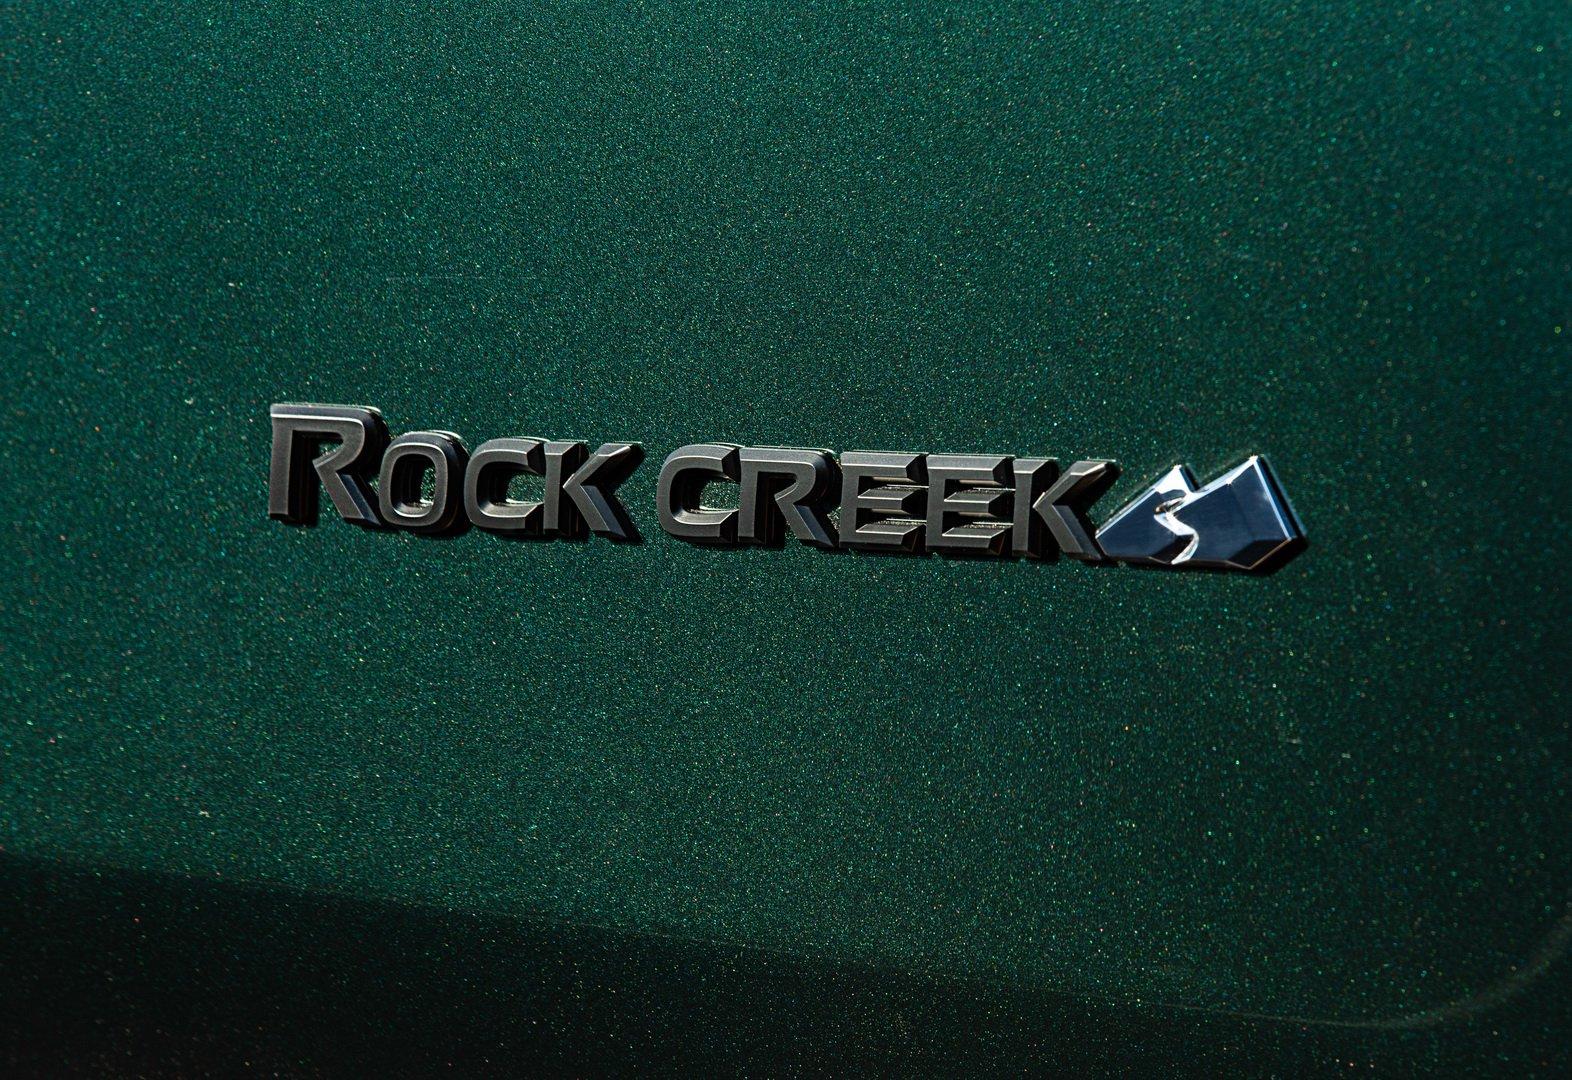 Nissan Pathfinder Rock Creek Edition 2019 (11)